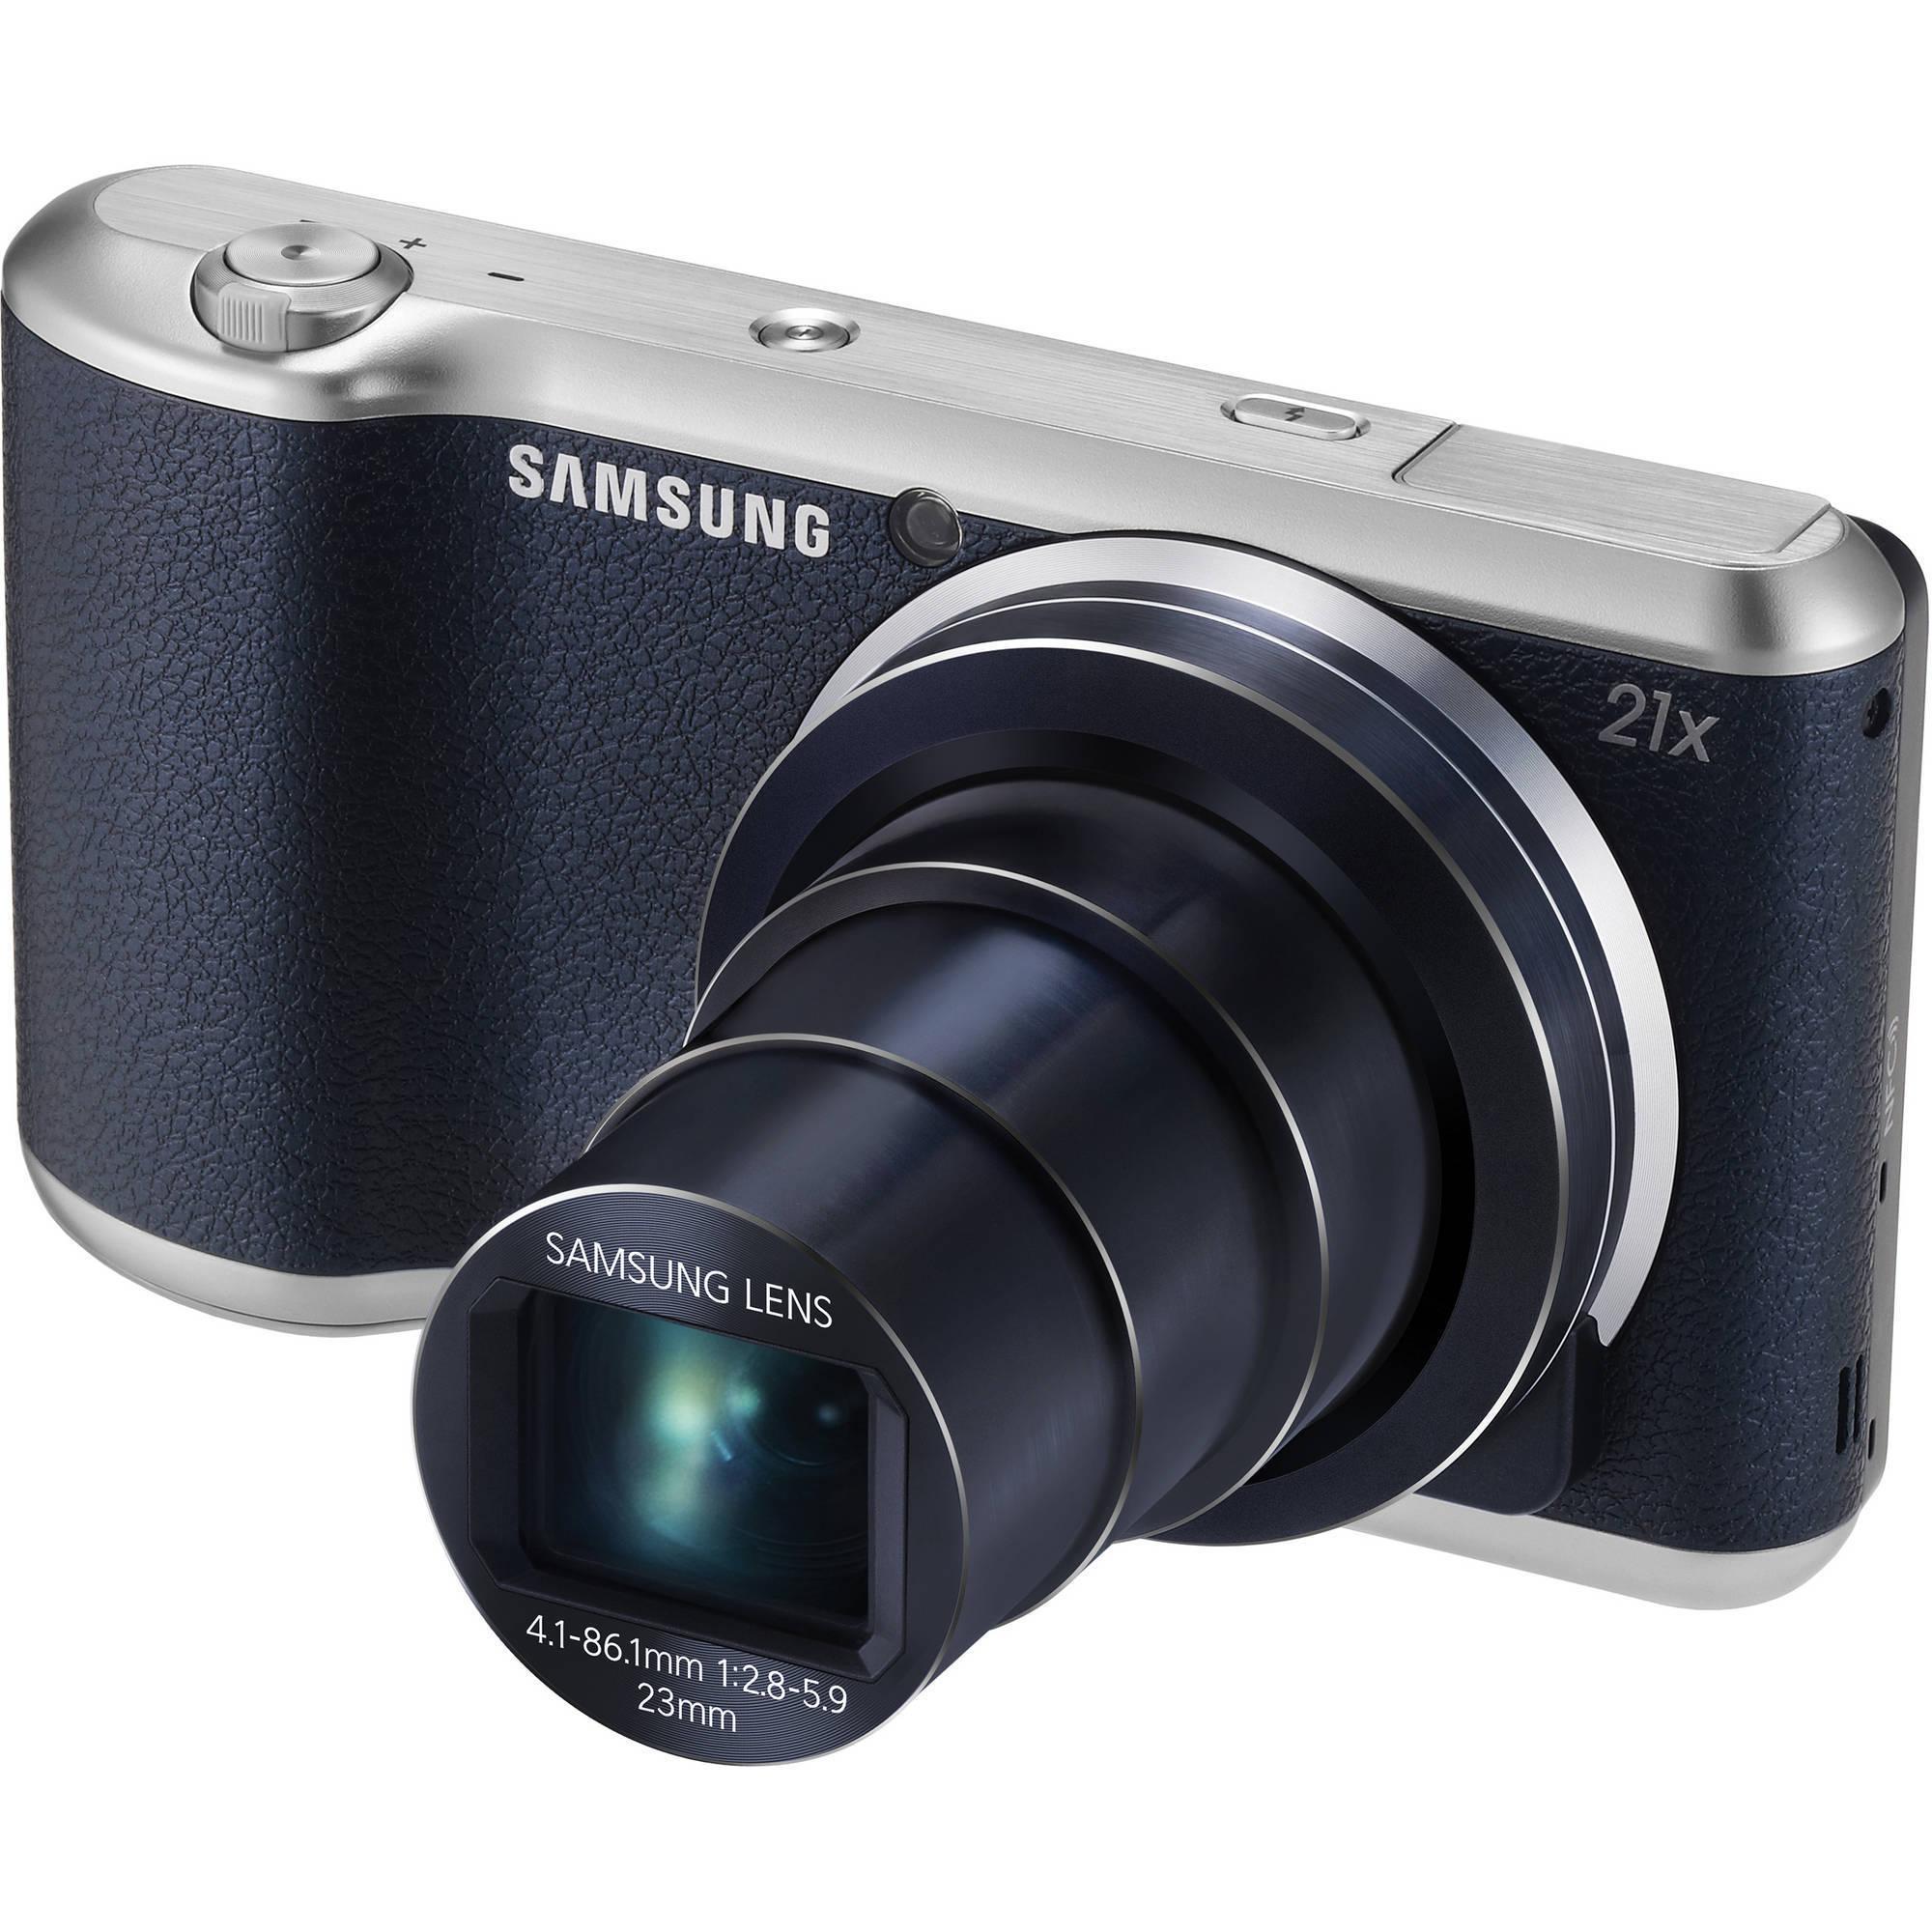 Samsung Galaxy EK-GC200 16.3 Megapixel Compact Camera - B...